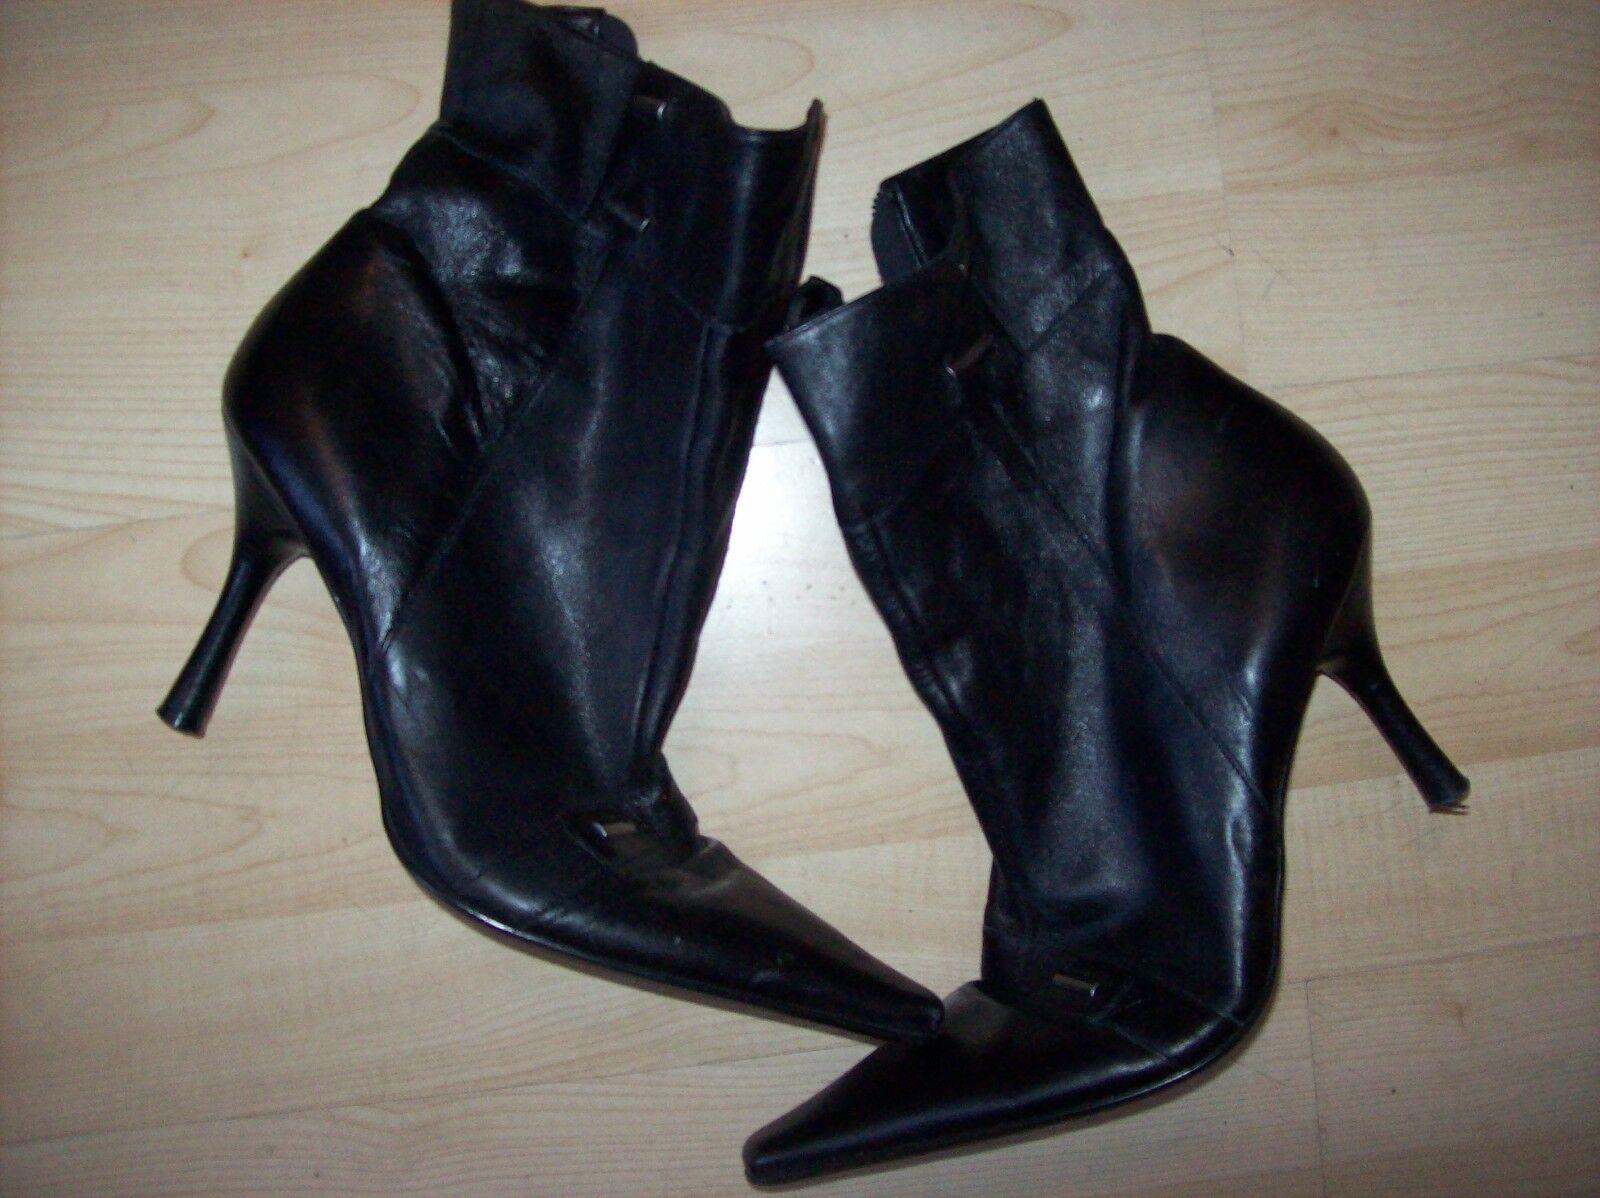 RAVEL WOMENS BLACK LEATHER MID CALF BOOT SIZE UK 7, EU 40, USED SLIGHT HEEL WEAR